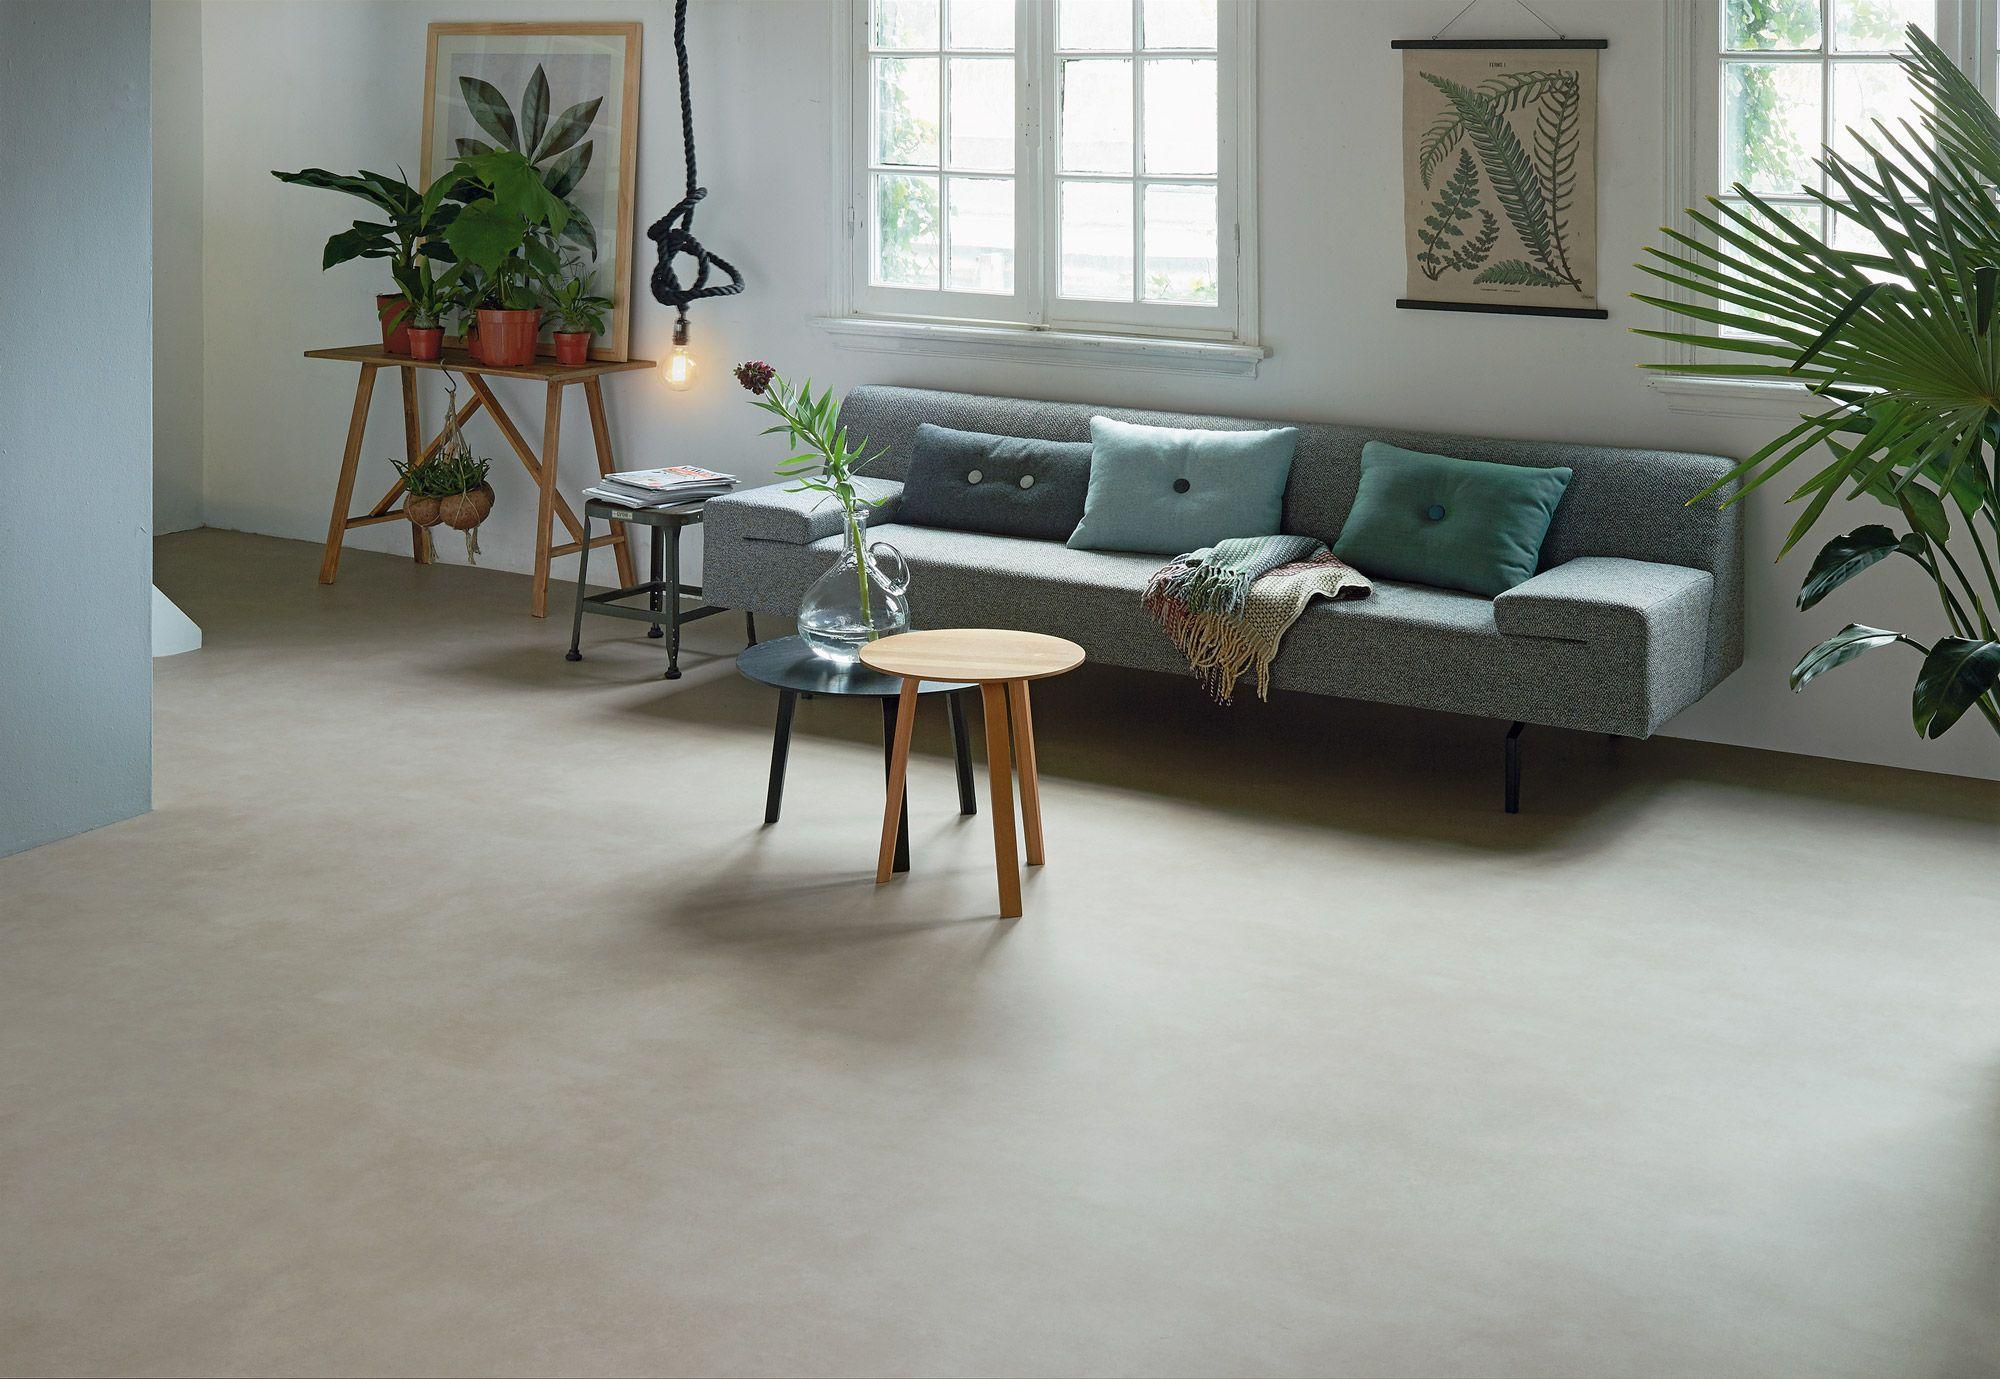 Pvc Vloer Vtwonen : Novilon vtwonen zand vloer home green sofa home reno flooring